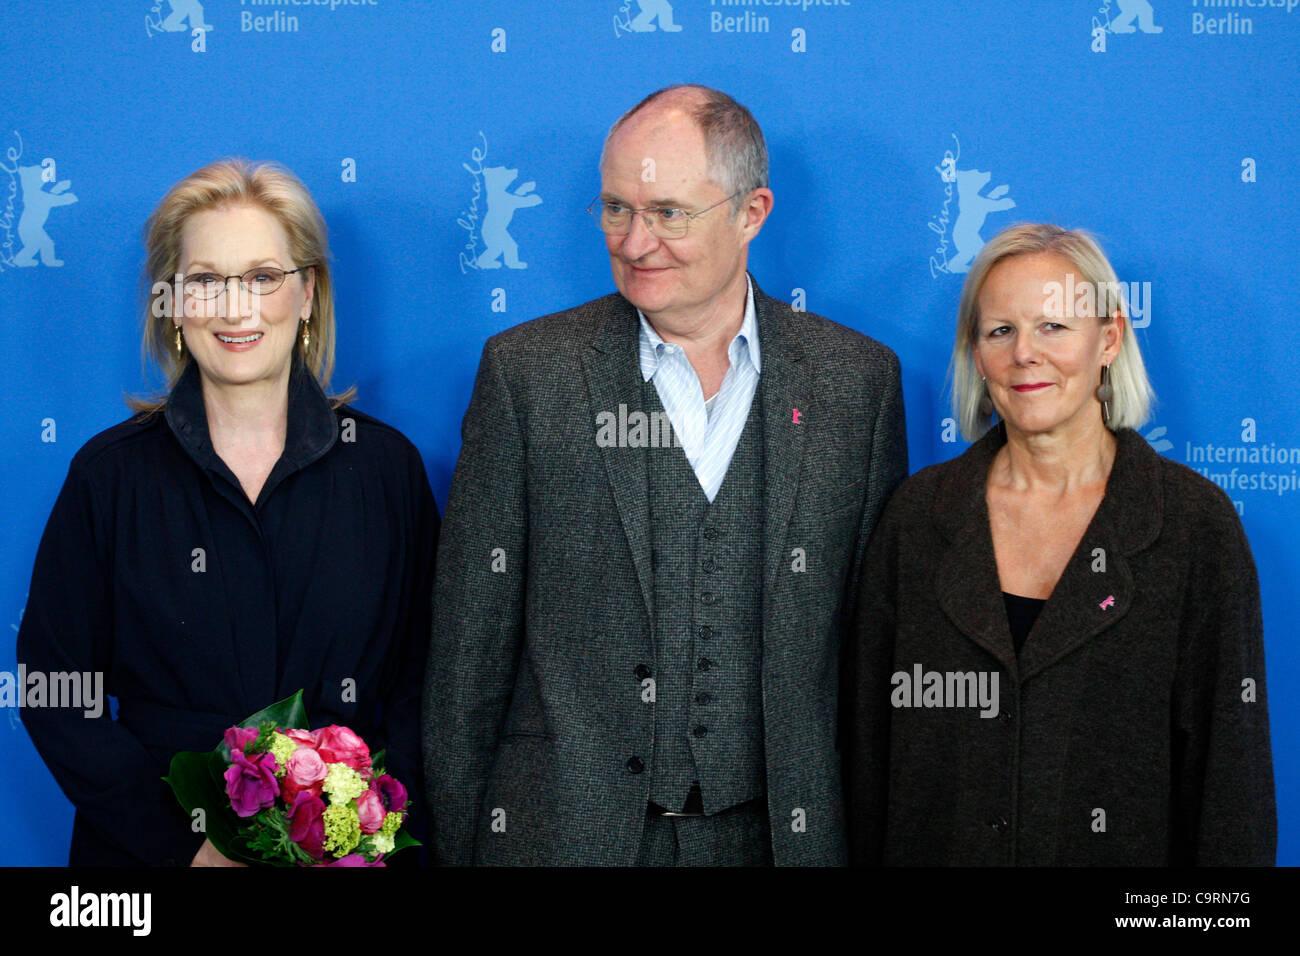 14 February 2012 Berlin Germany. Actress MERYL STREEP, actor JIM BROADBENT and director PHYLLIDA LLOYD pose for - Stock Image